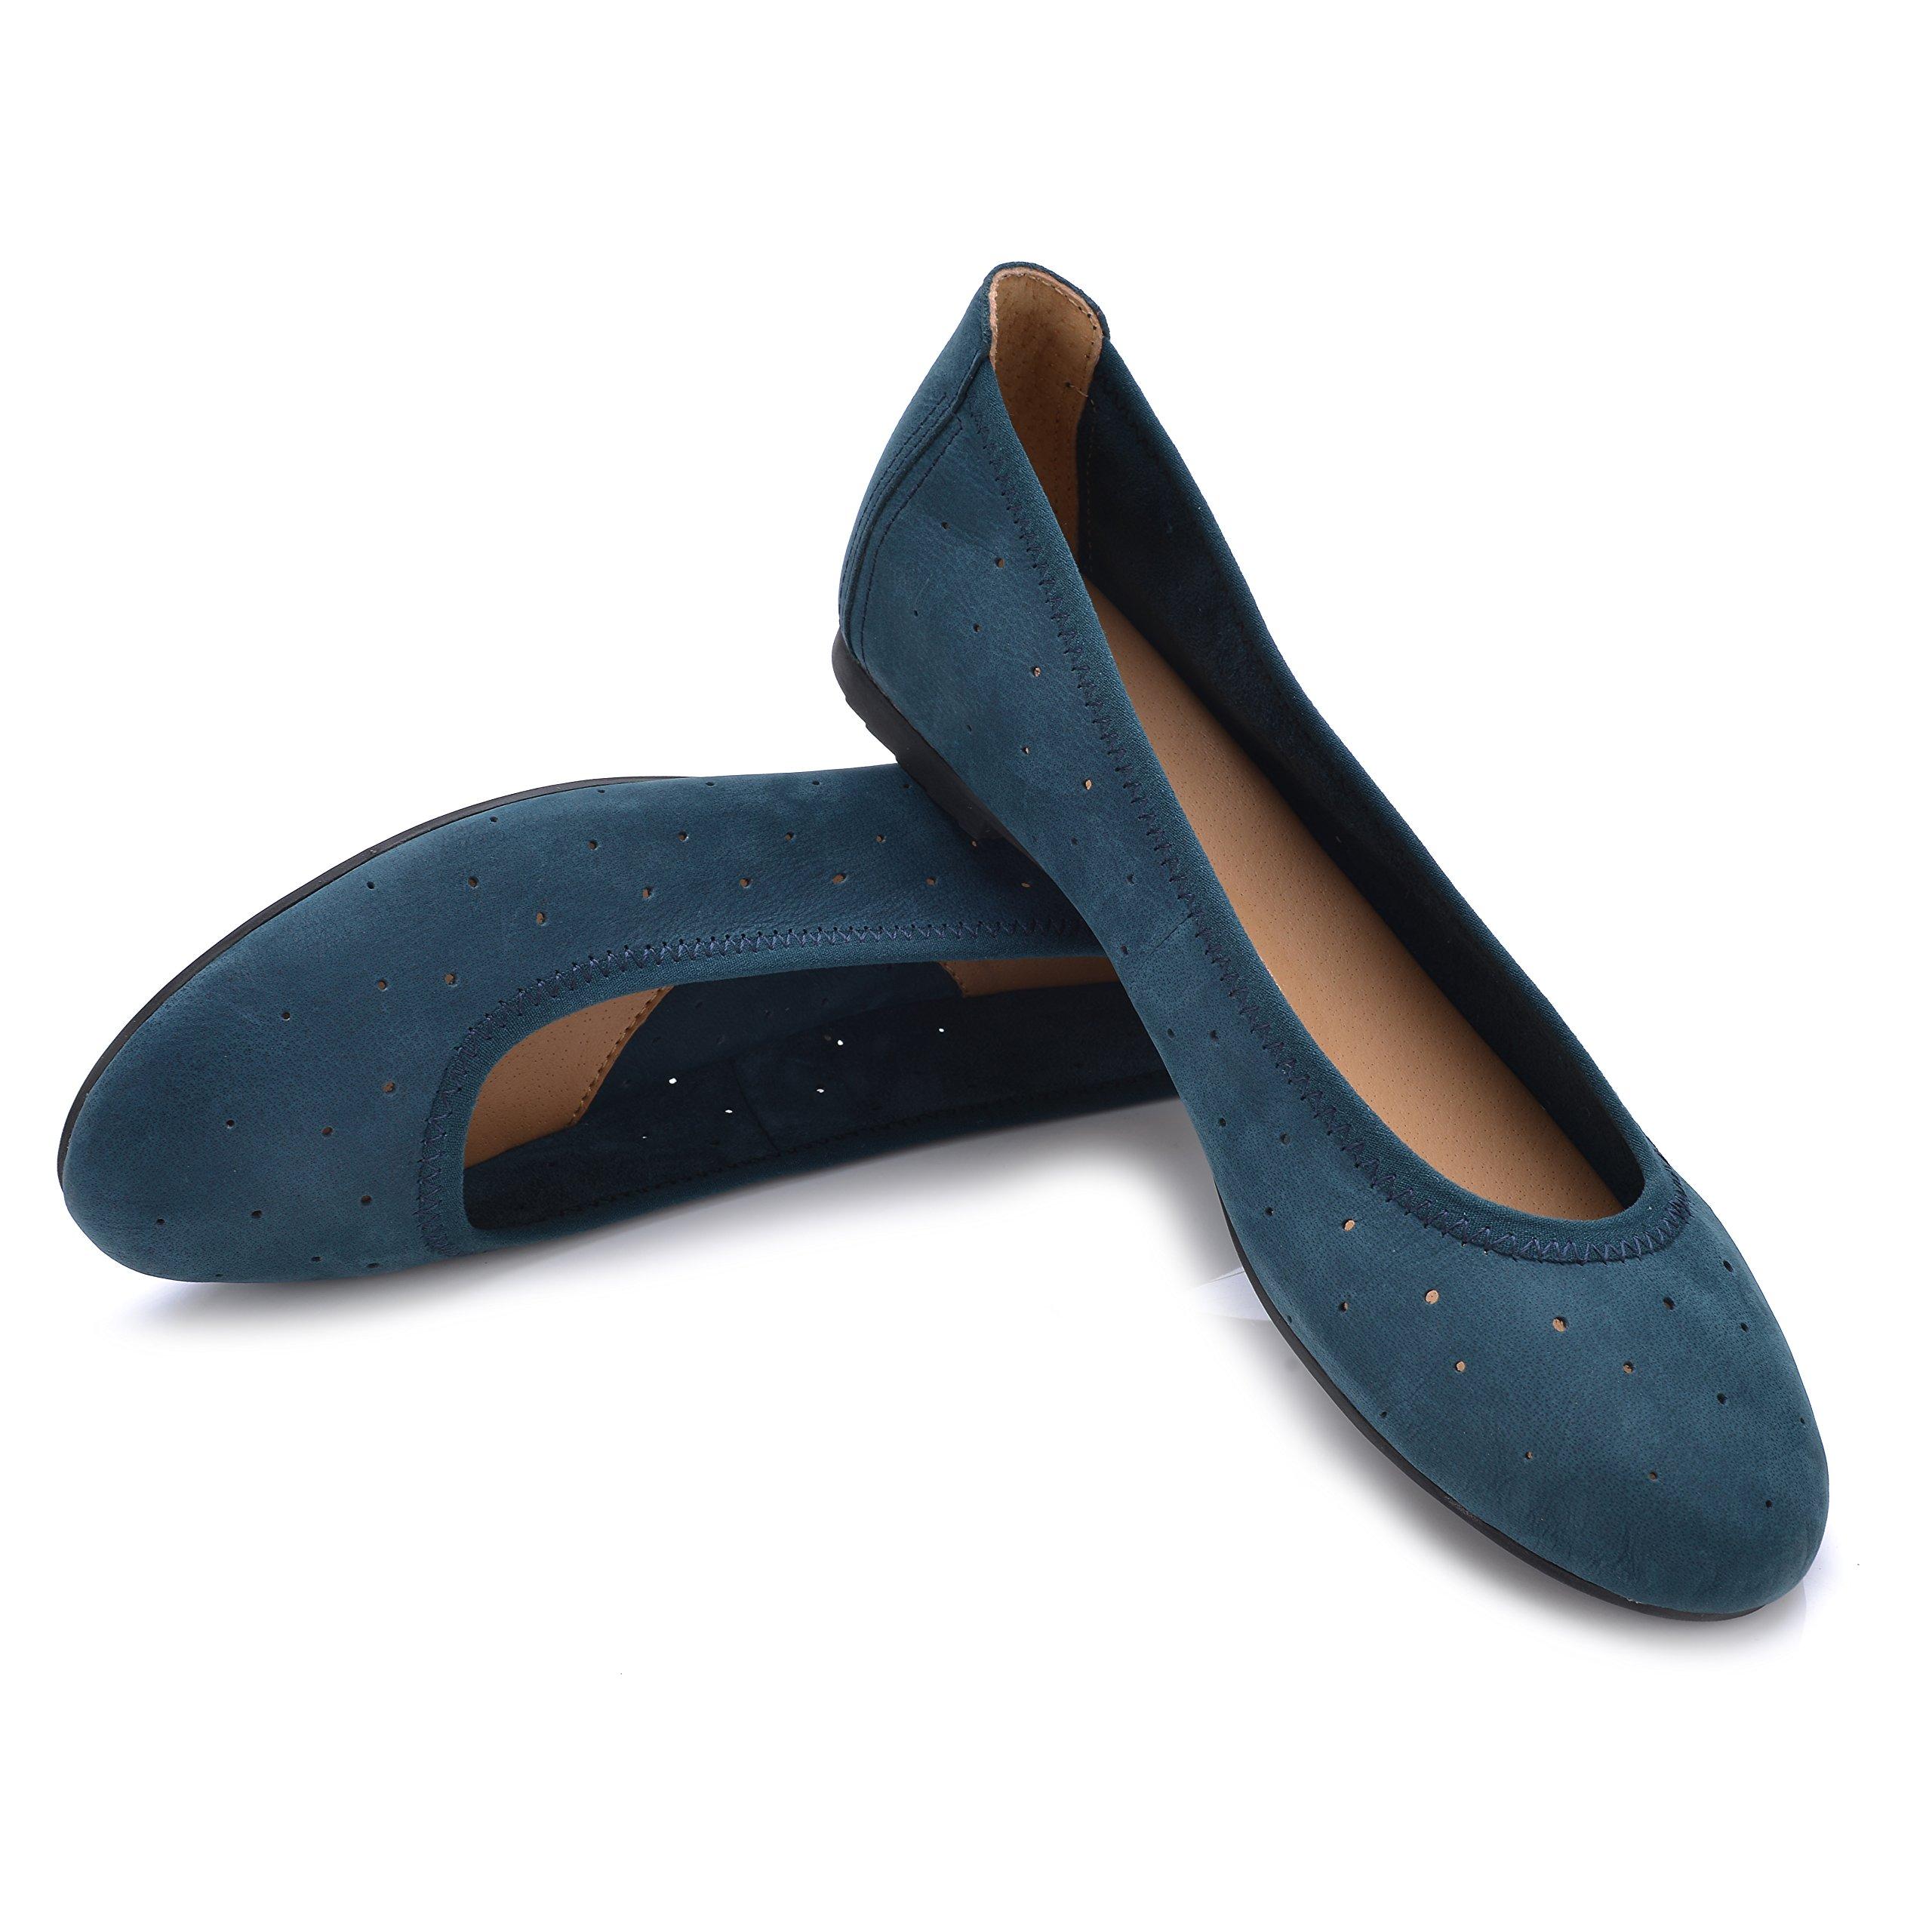 Eureka USA Women's Dianne Leather Ballet Flat